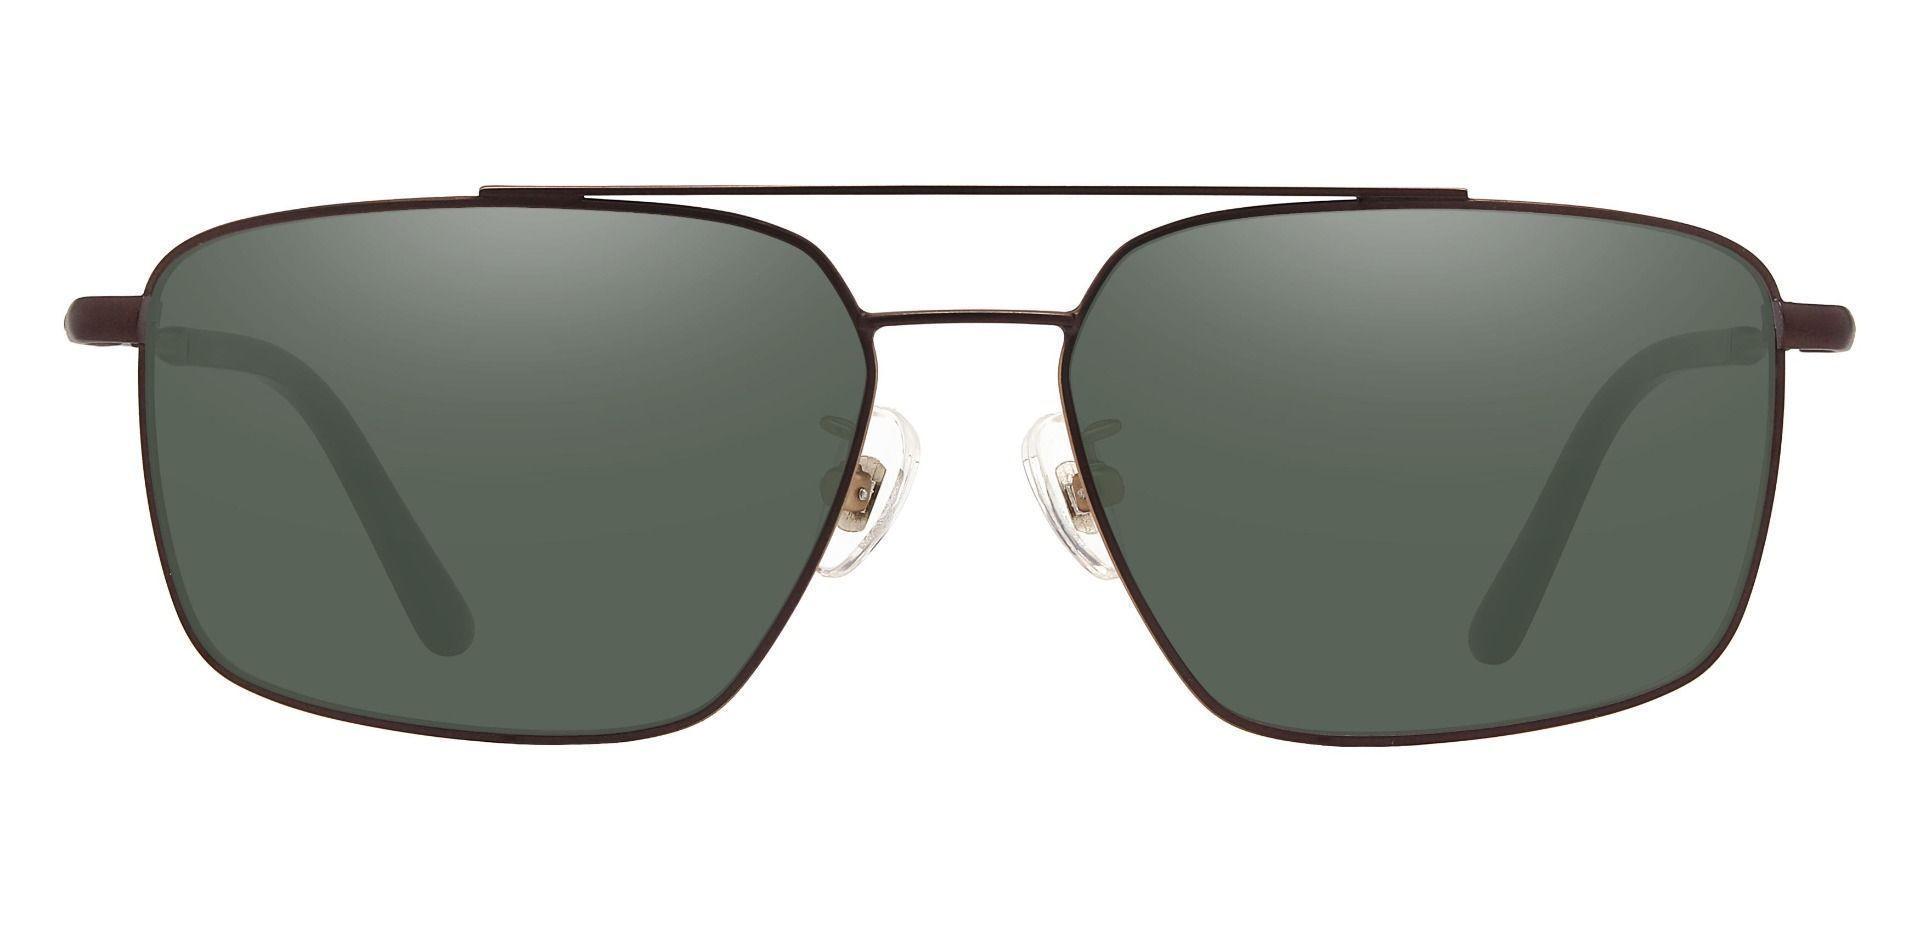 Barlow Aviator Prescription Sunglasses - Brown Frame With Green Lenses